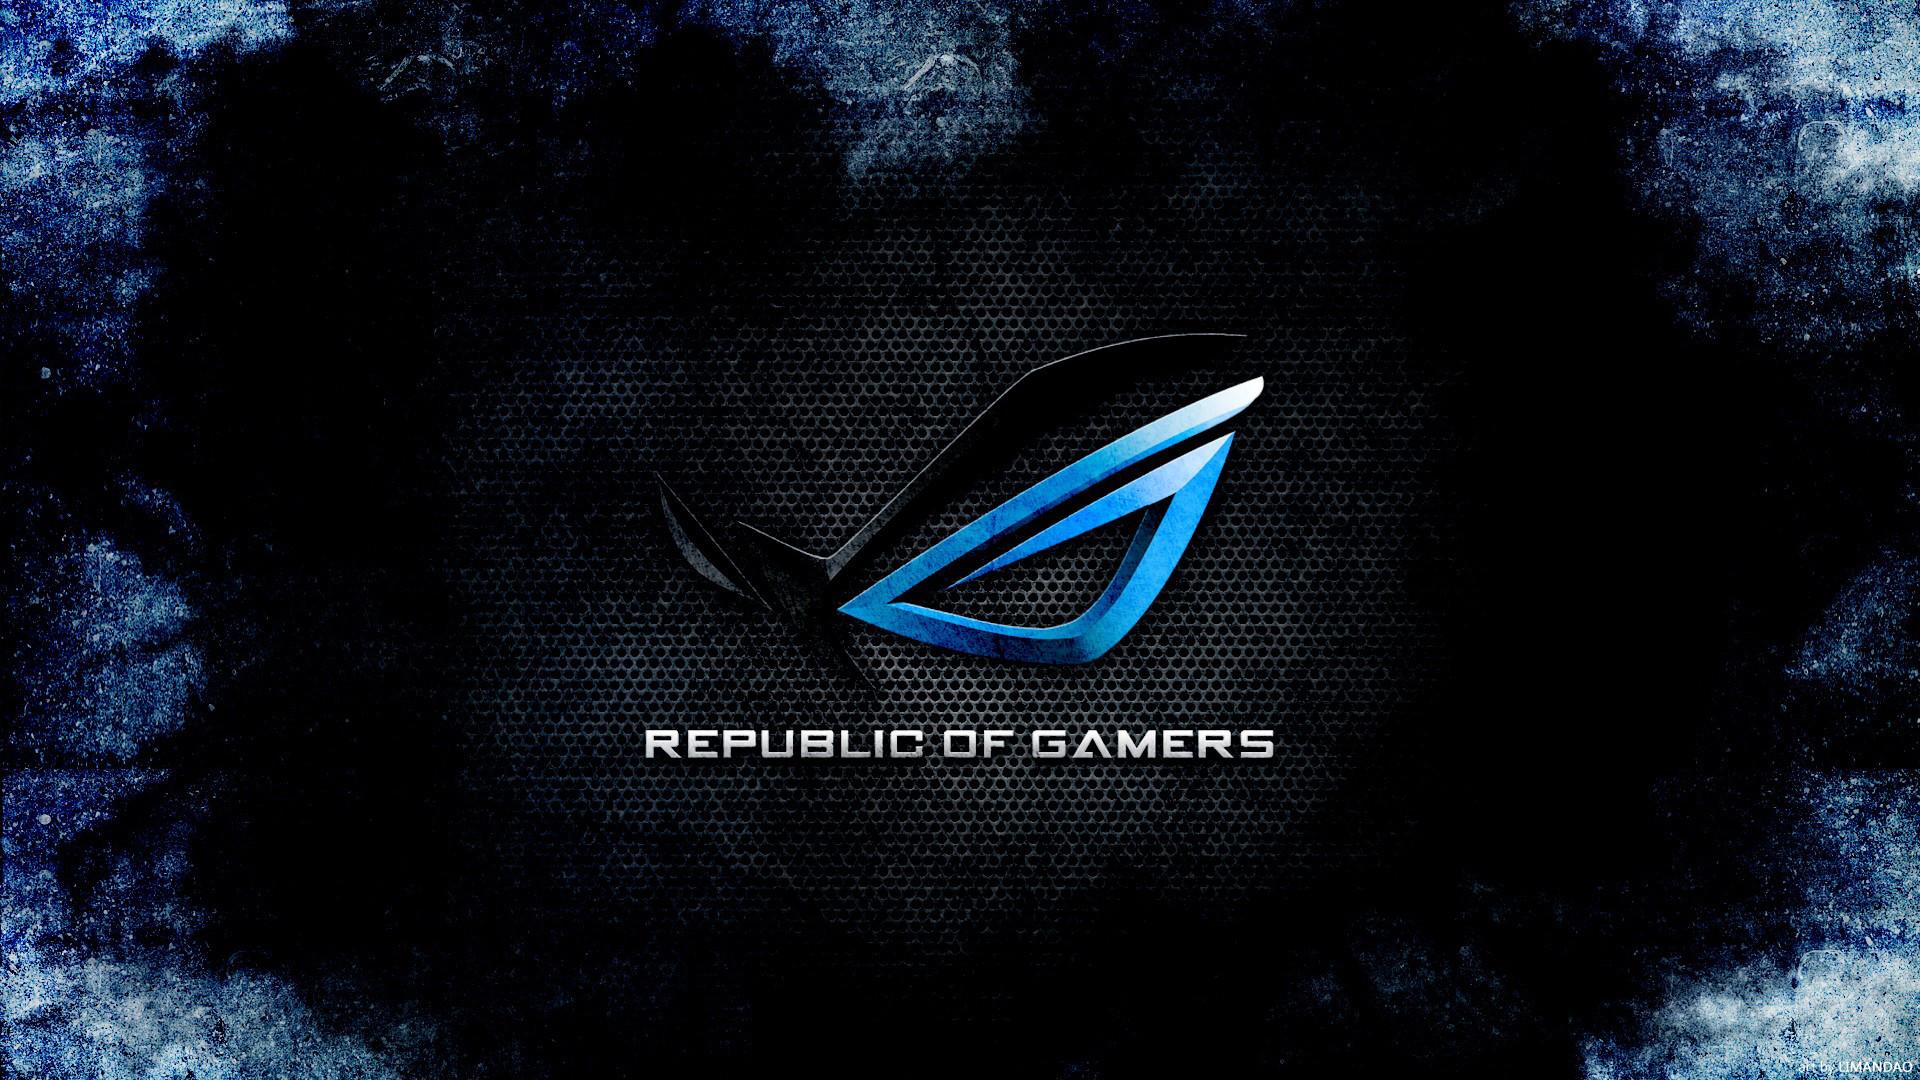 Republic of Gamers Dark Blue 17 Wallpaper HD